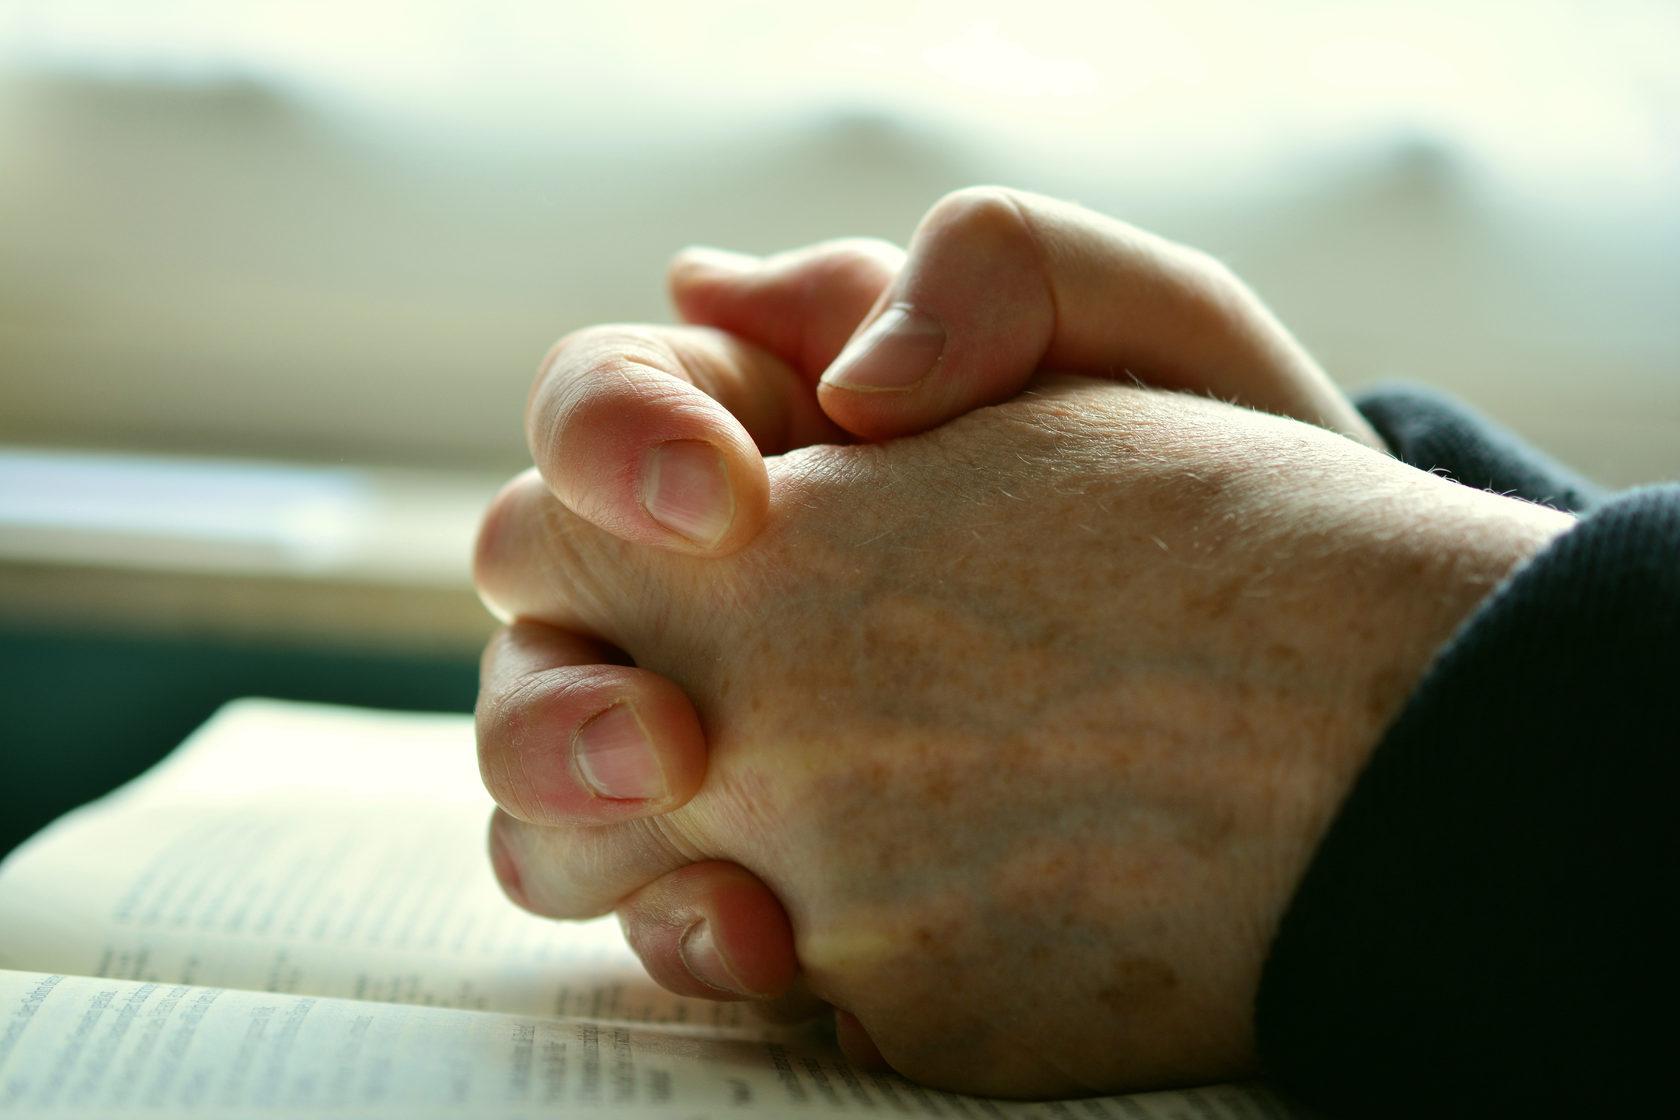 Prayer, clasped hands